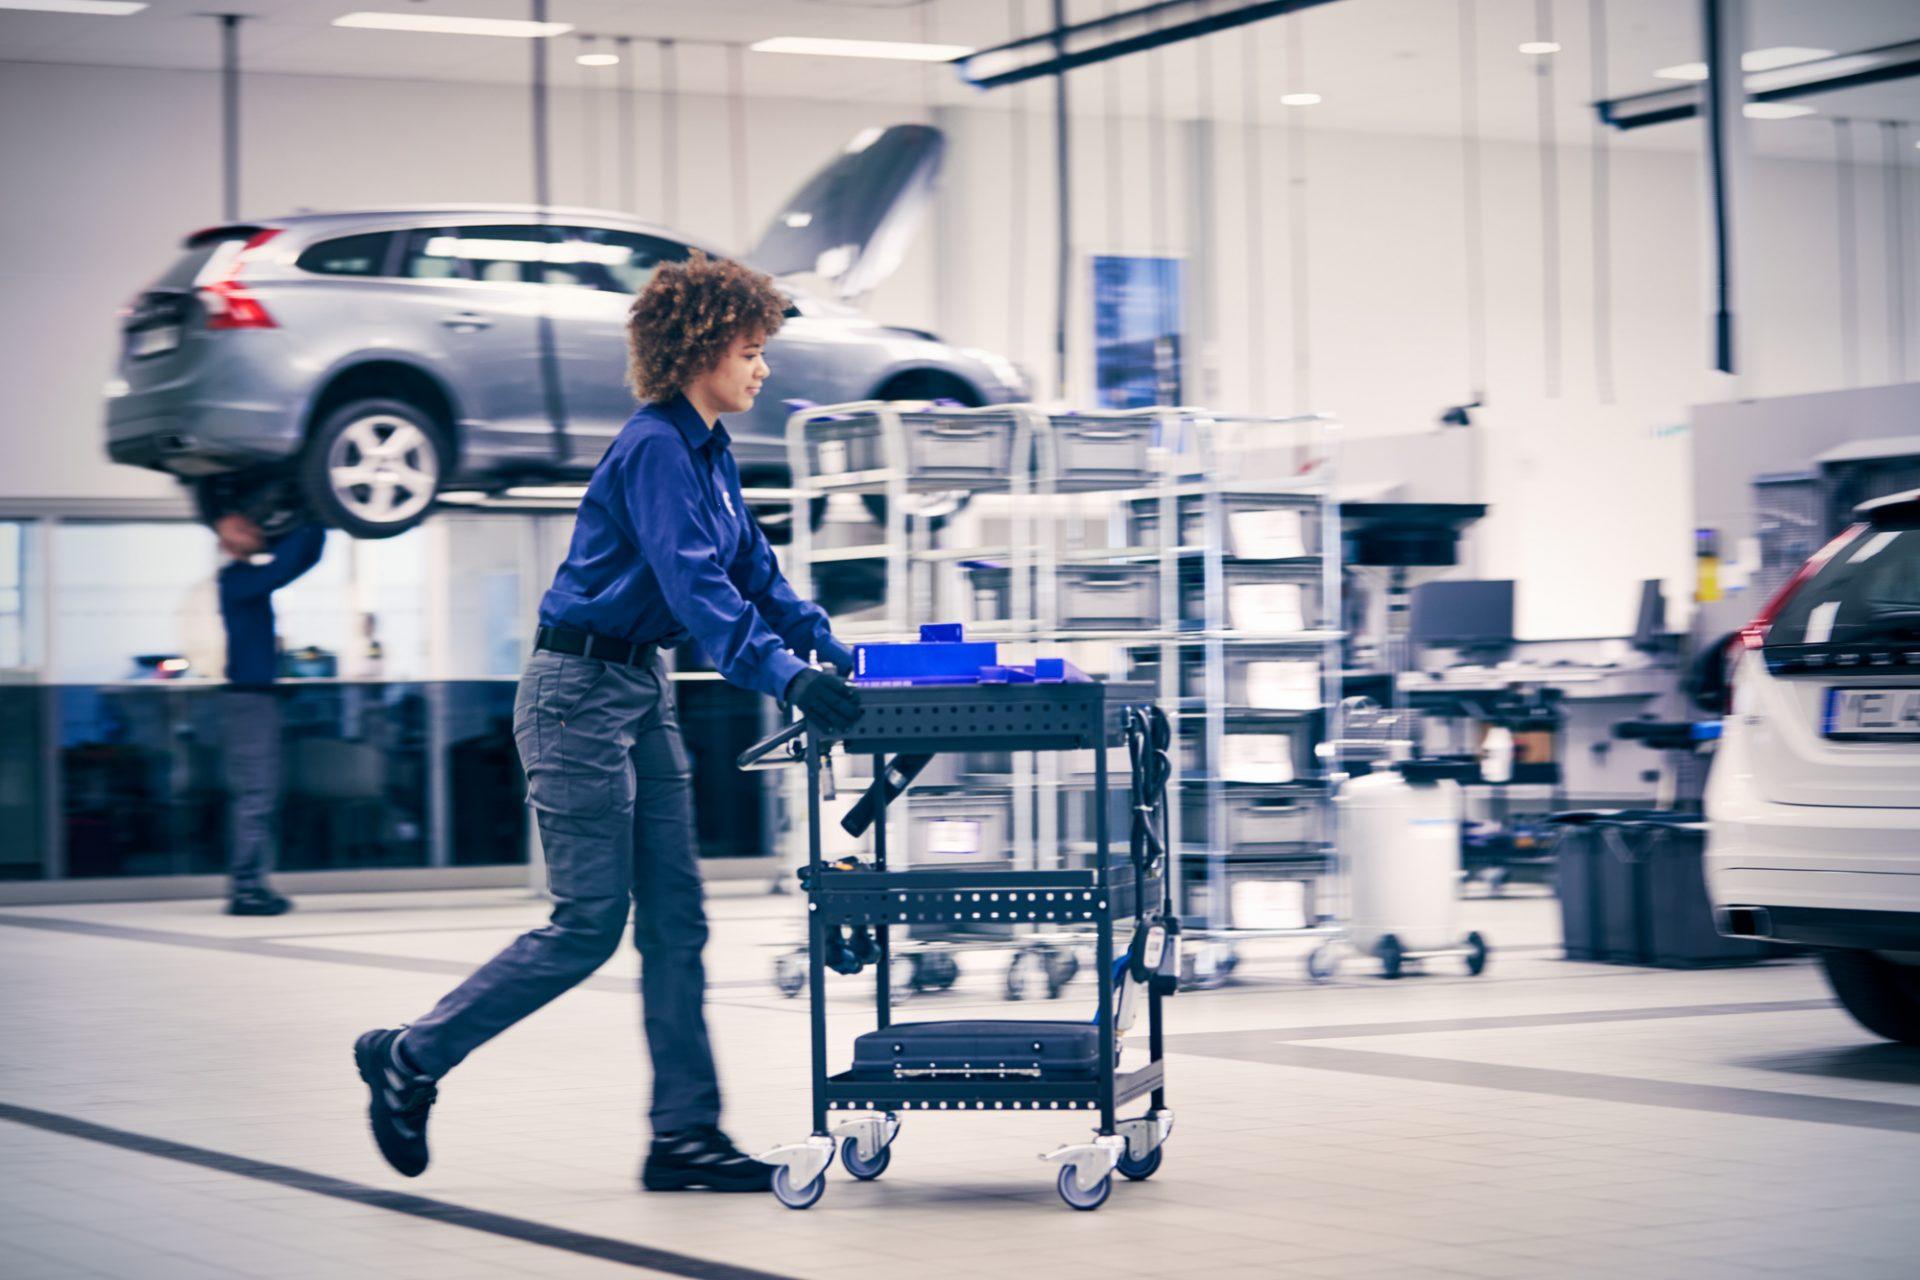 Volvo Customer Service Process, Retail_2018_36